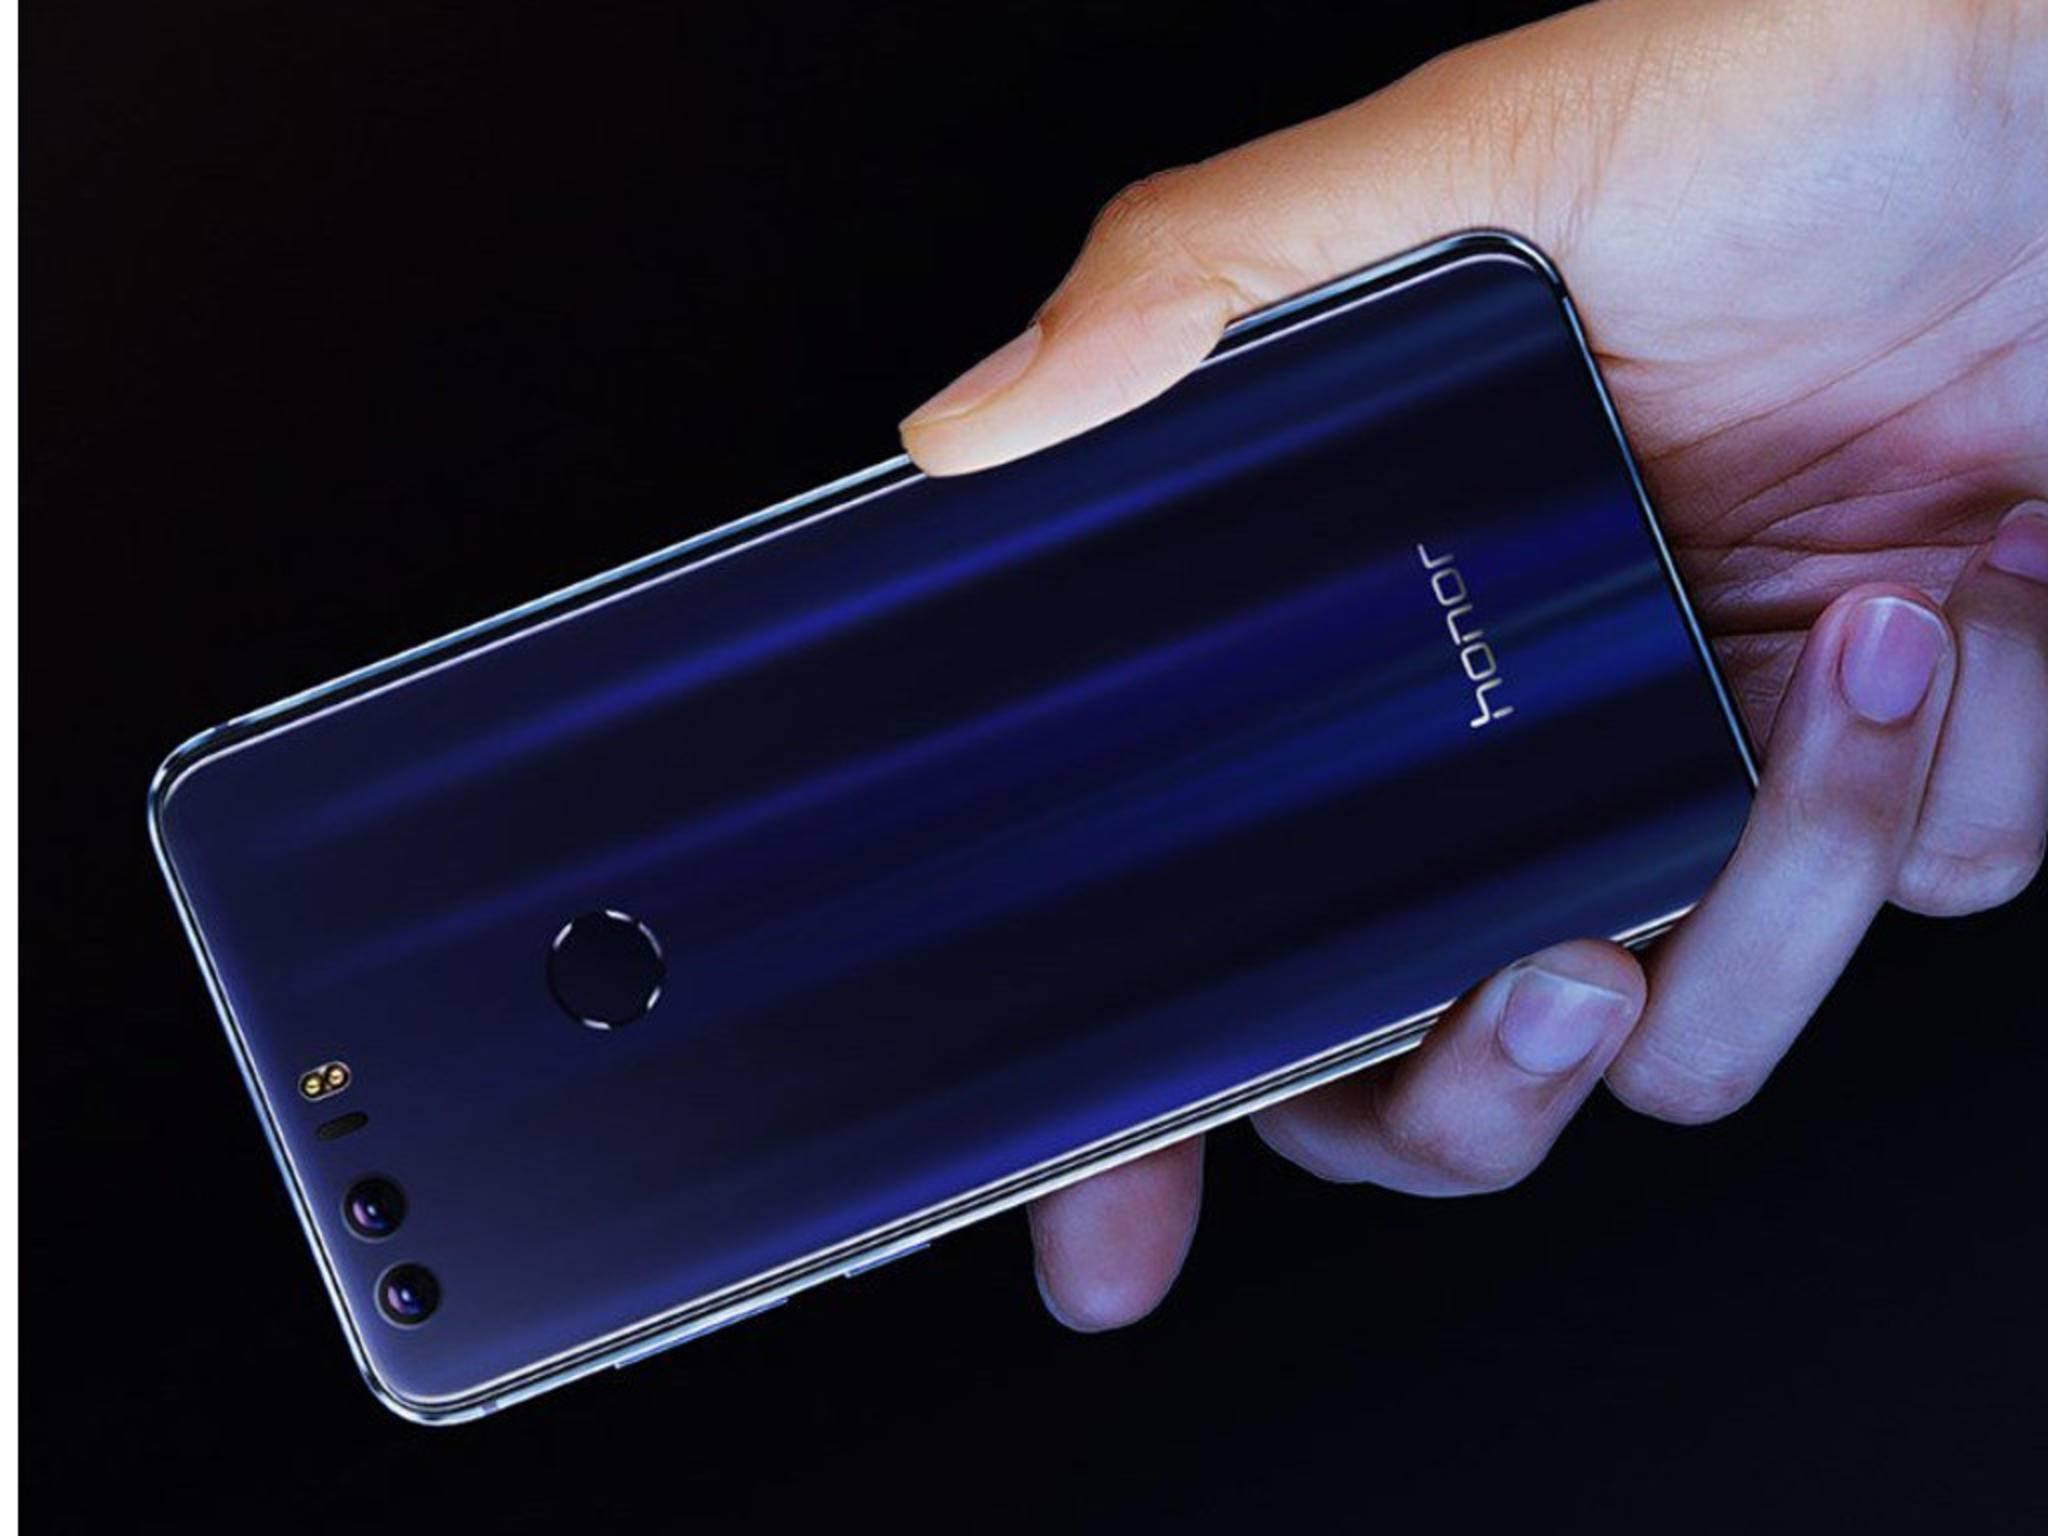 Honor 8: Günstiges Smartphone mit Dual-Kamera.